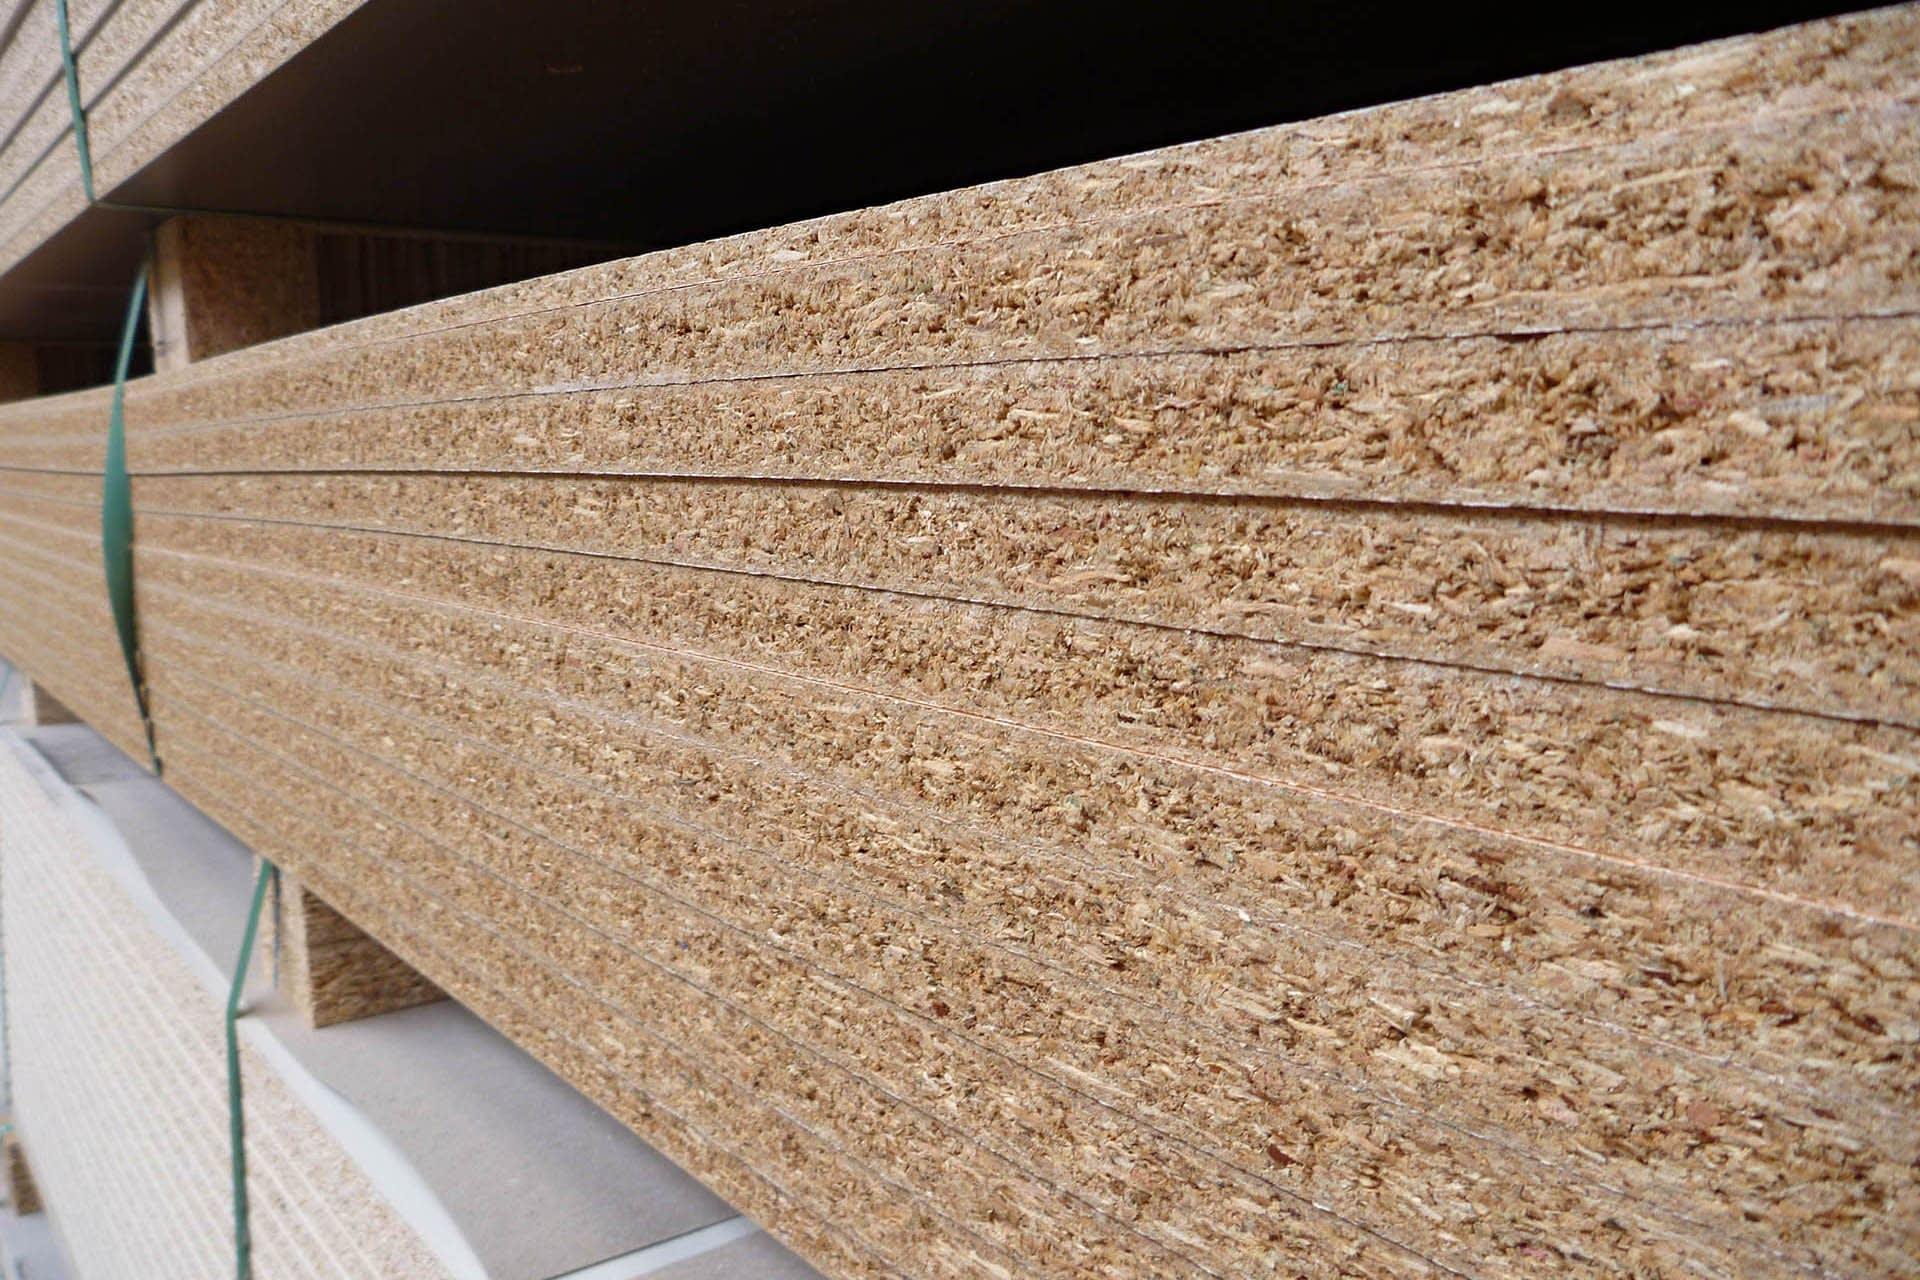 OSB (oriental strand board) stack sheet materials